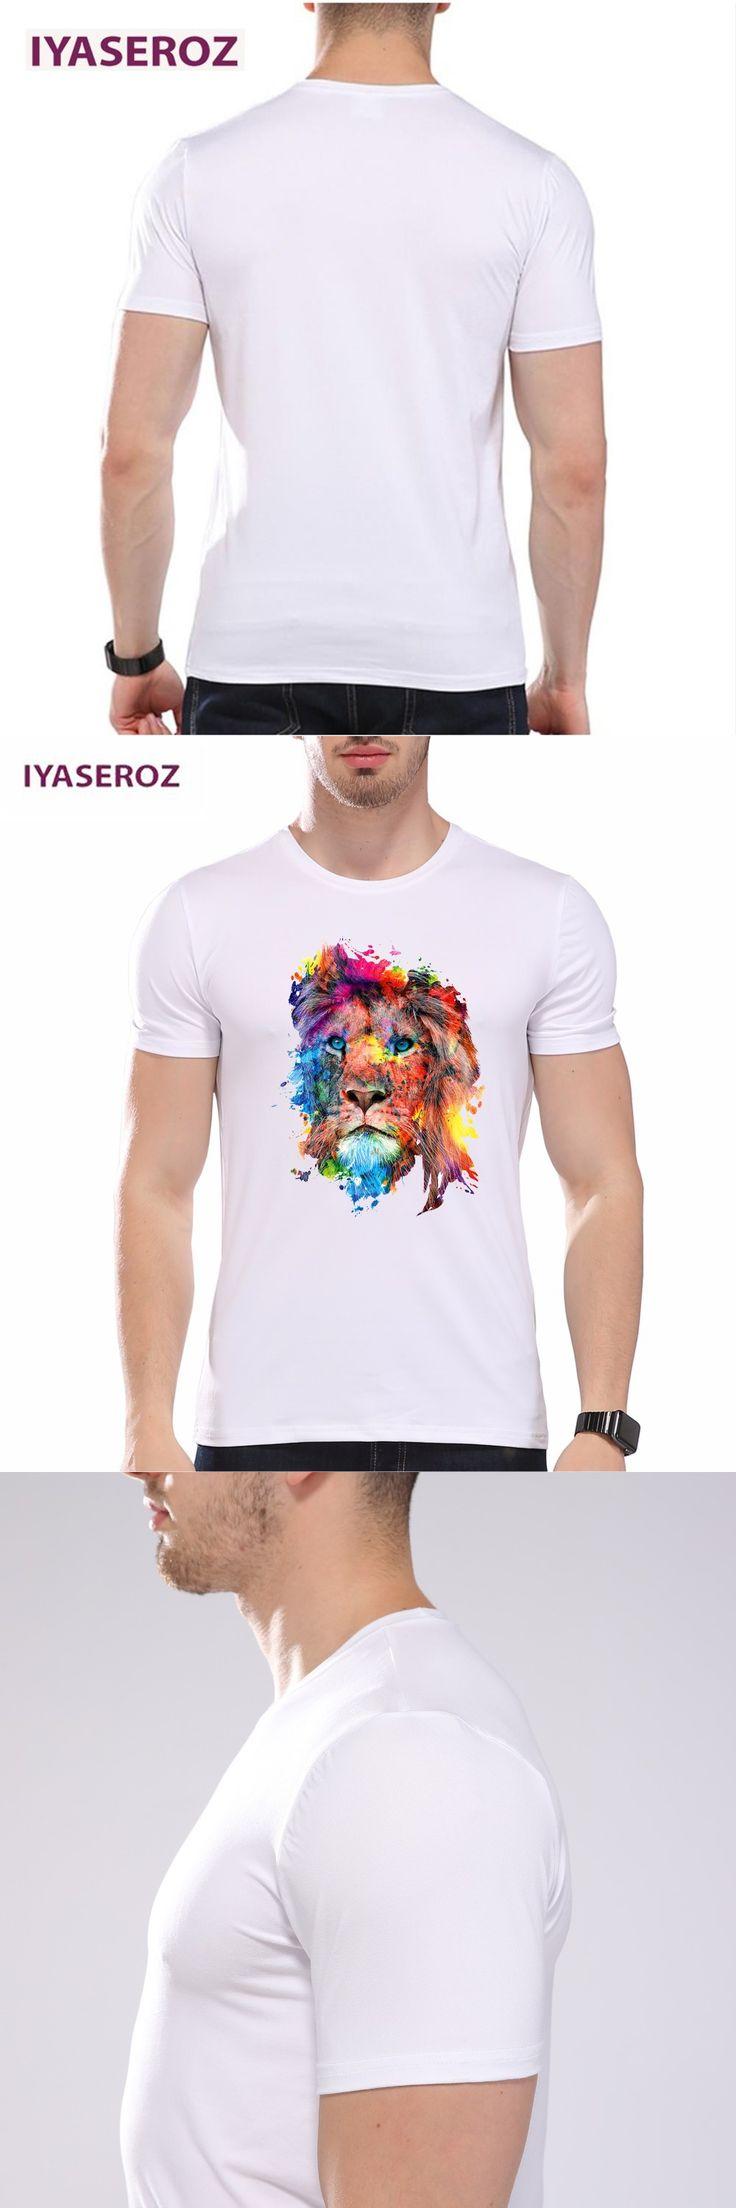 IYASEROZ 2017 Men's  Summer Halajuku Modal T-shirt Funny Colorful Lion Design Print Plus Size Short Sleeve Tops Tees for Unisex